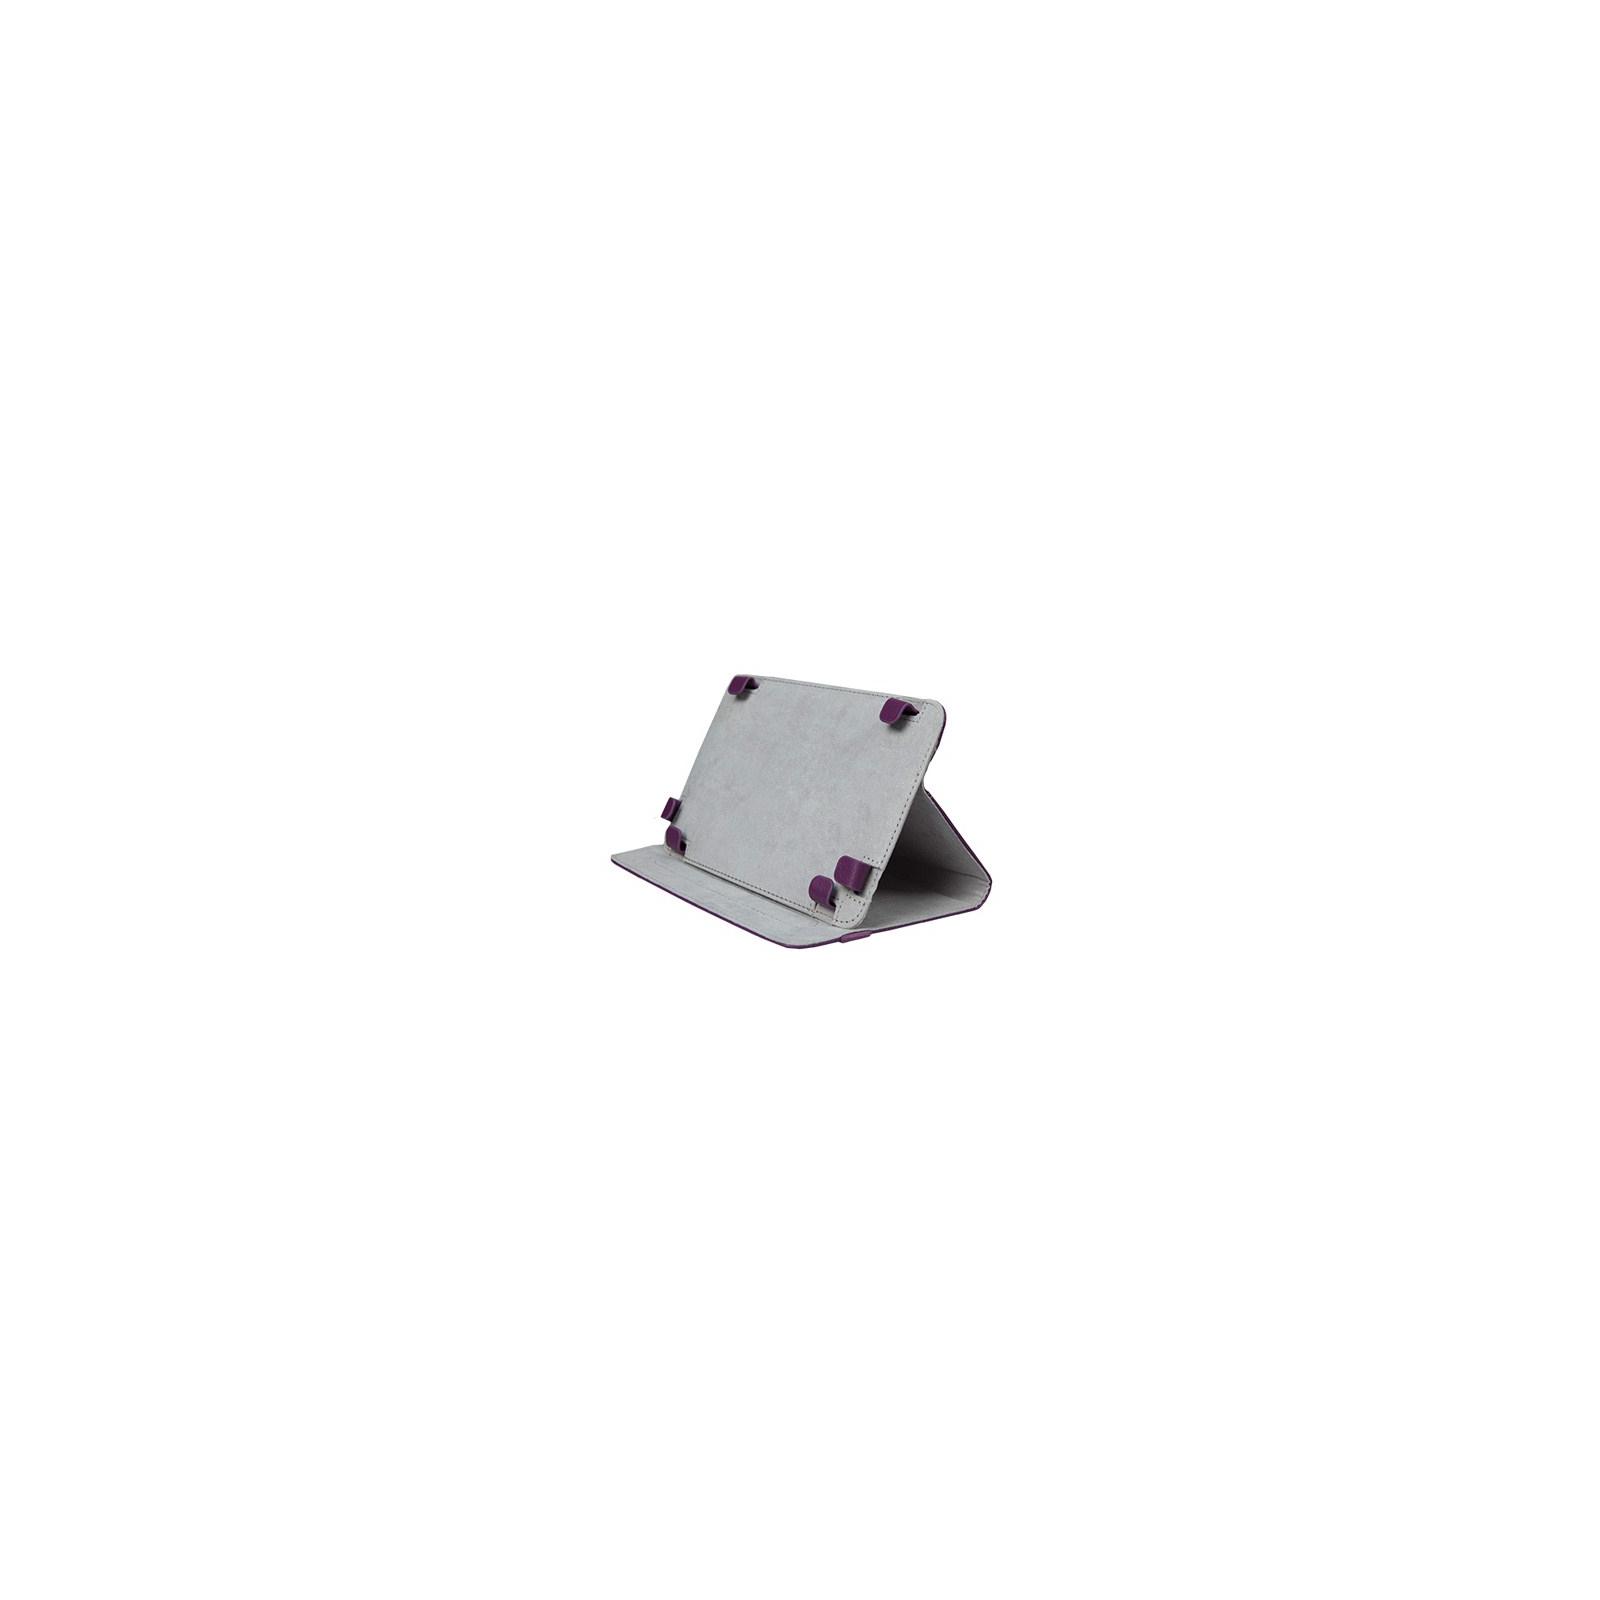 Чехол для планшета Continent 7 Universal (UTH-71VT) изображение 2